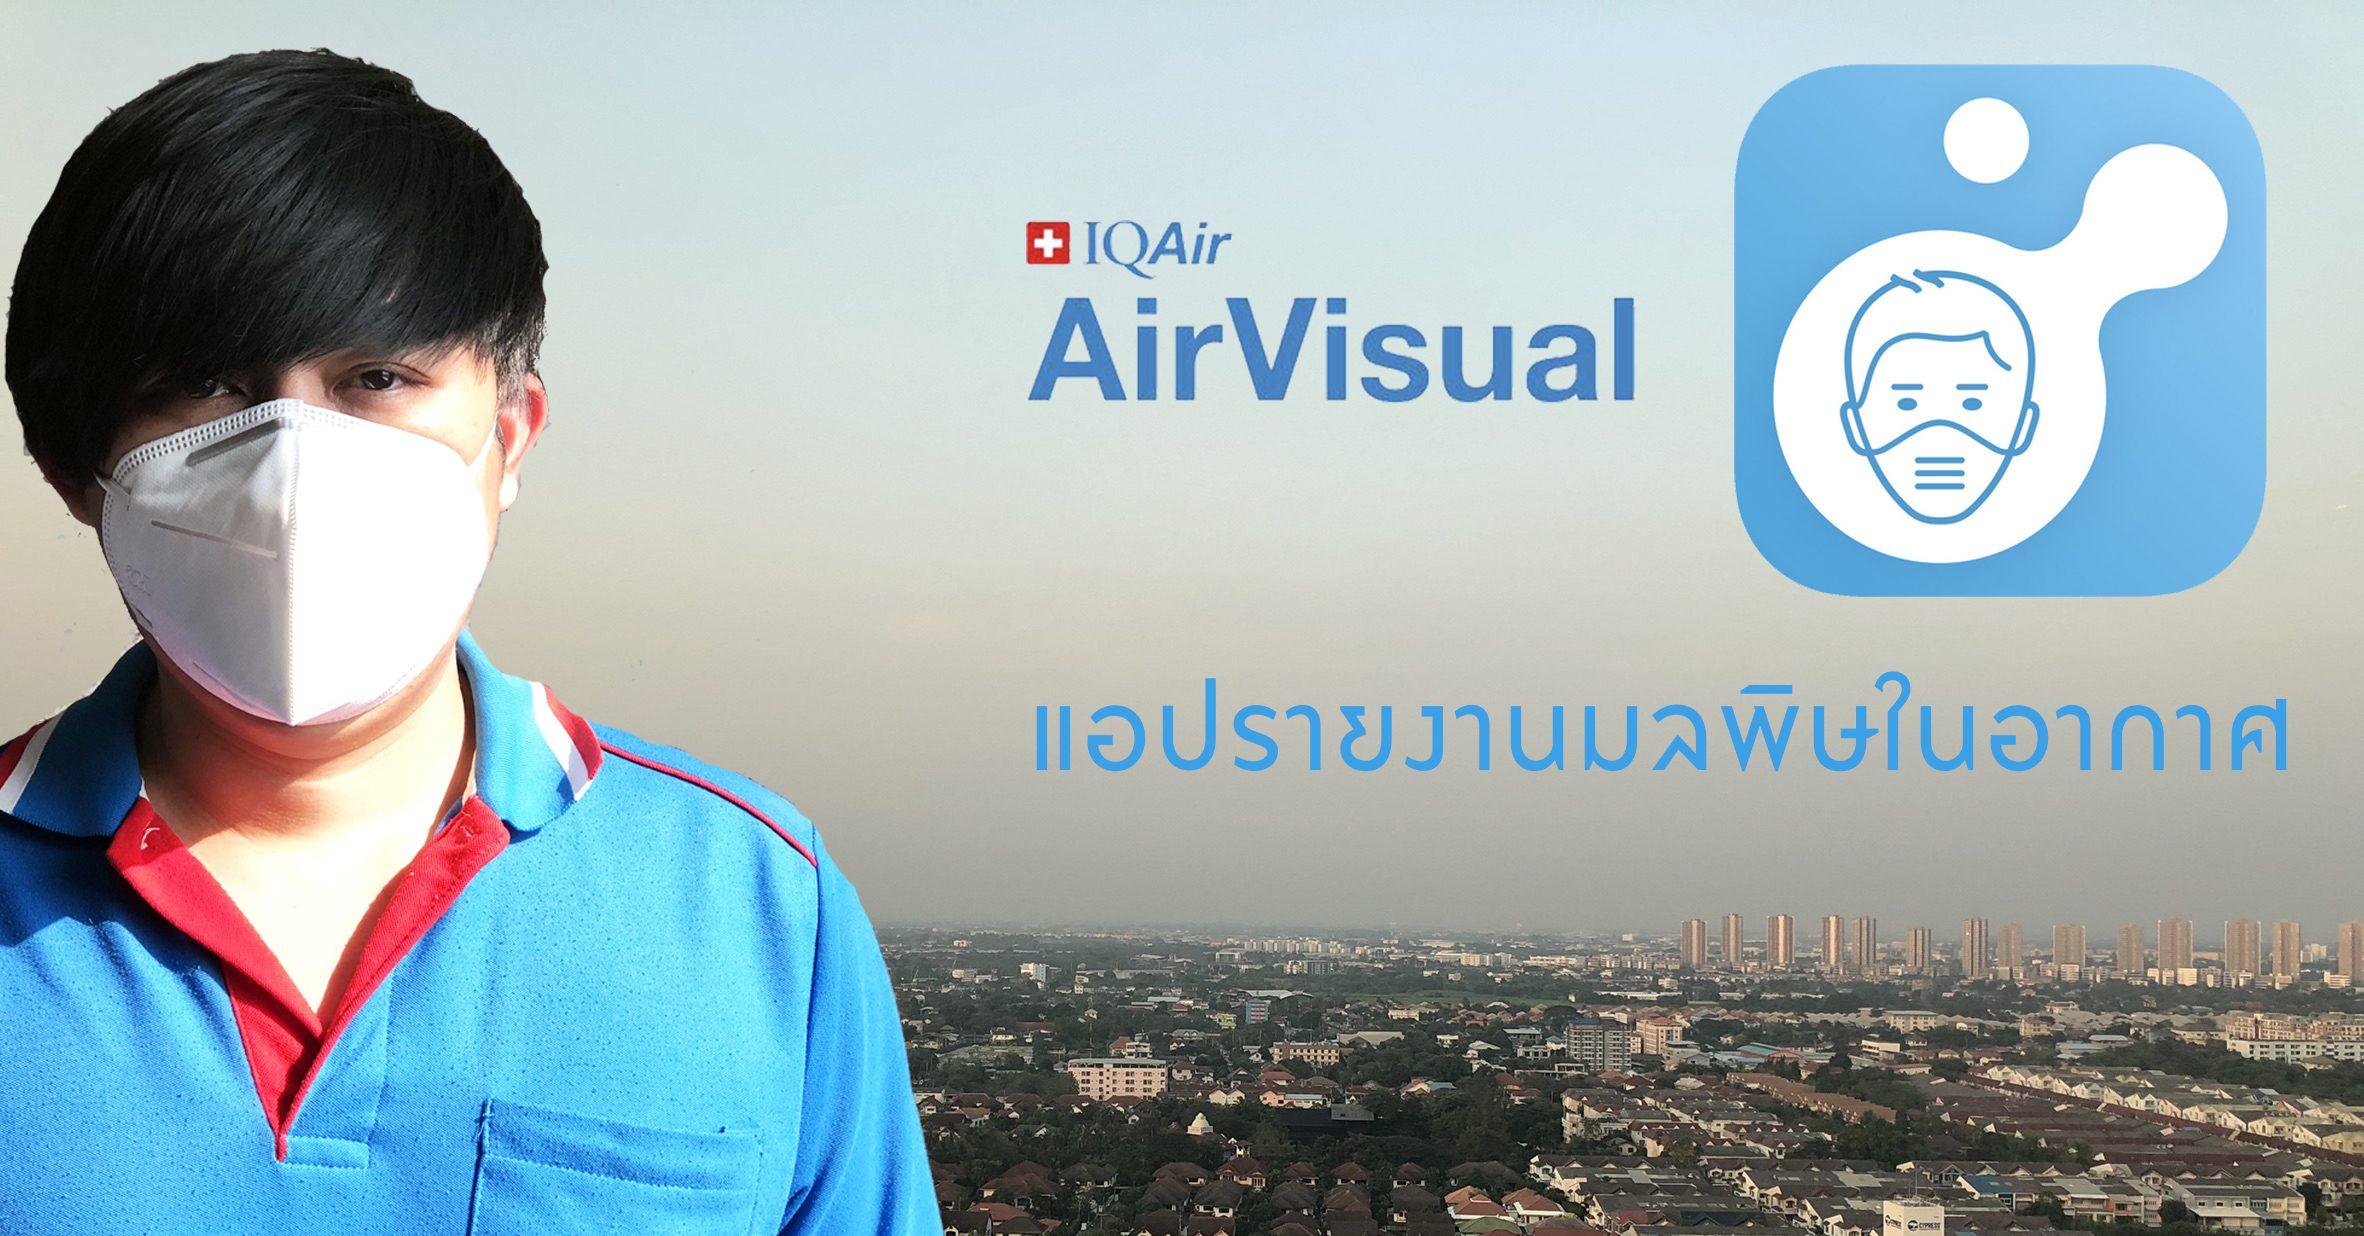 AirVisual แอปรายงานค่ามลพิษในอากาศ ที่ควรมีติดเครื่อง!!